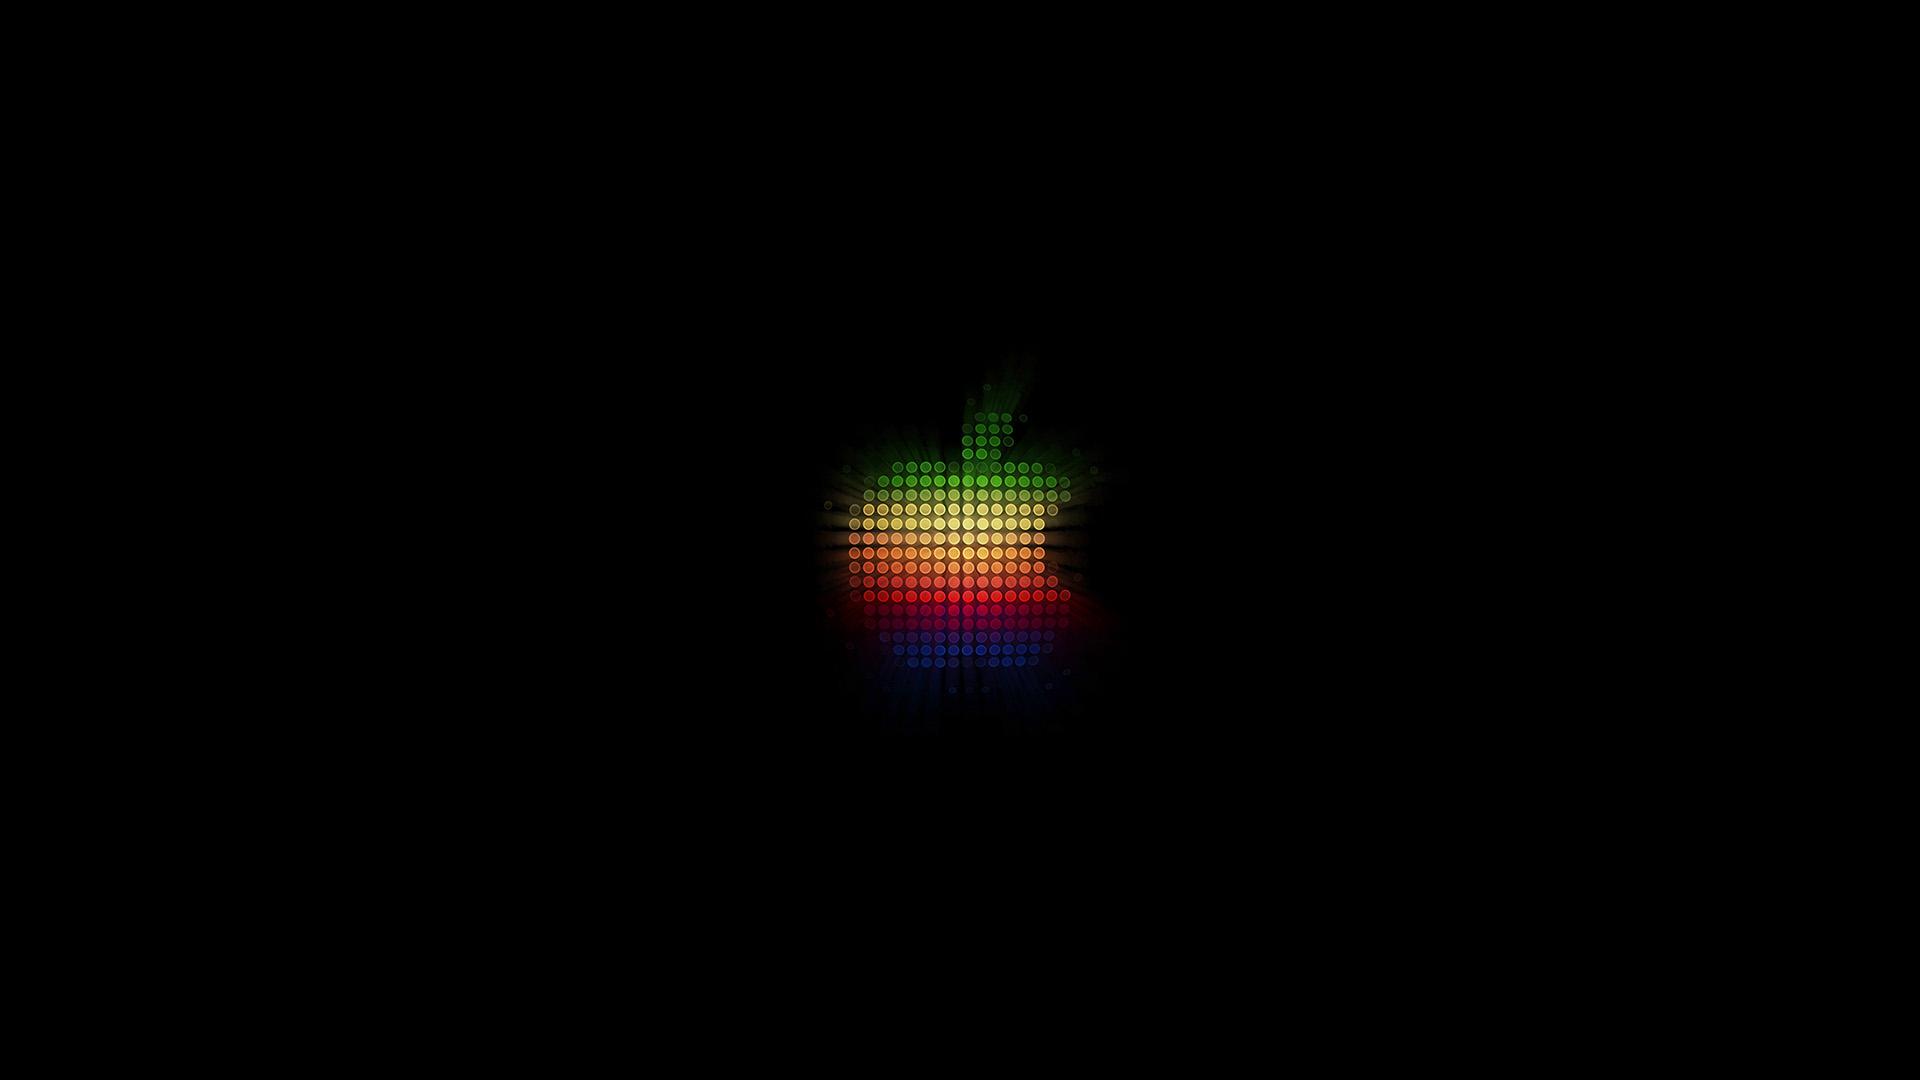 Black Iphone 7 Wallpaper Wallpaper For Desktop Laptop At40 Logo Apple Rainbow